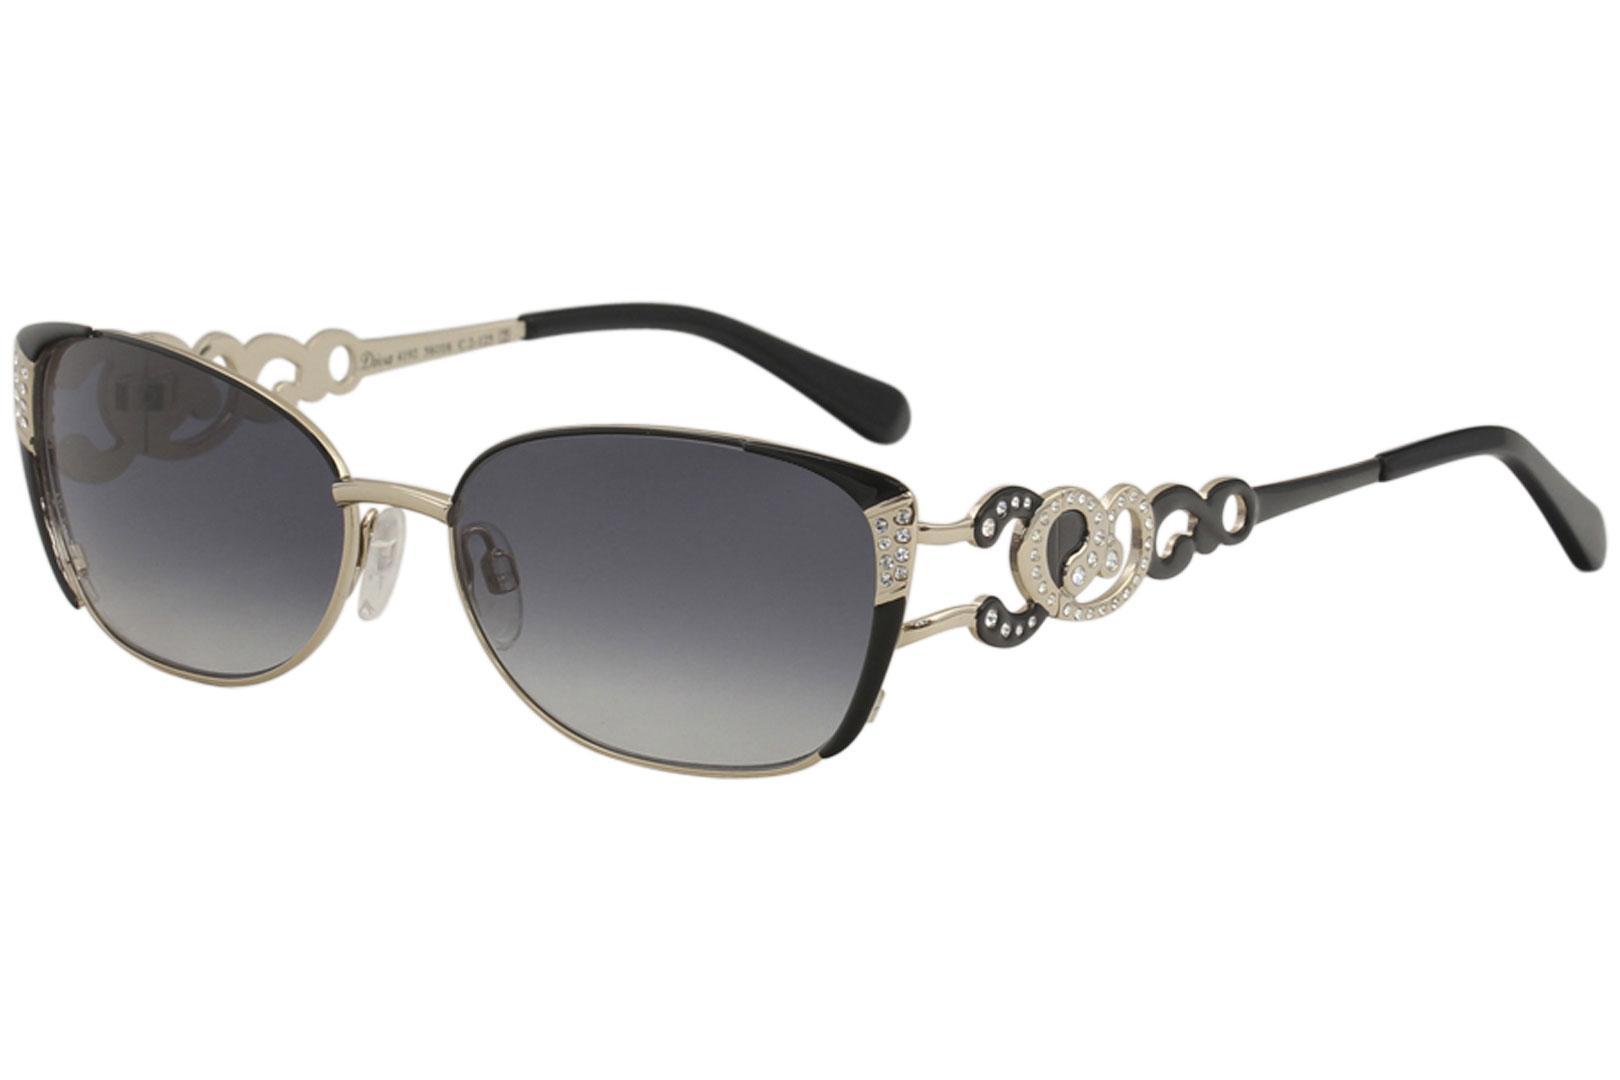 Image of Diva Women's 4192 Fashion Rectangle Sunglasses - Black Gold/Grey Gradient   02 - Lens 56 Bridge 16 Temple 125mm